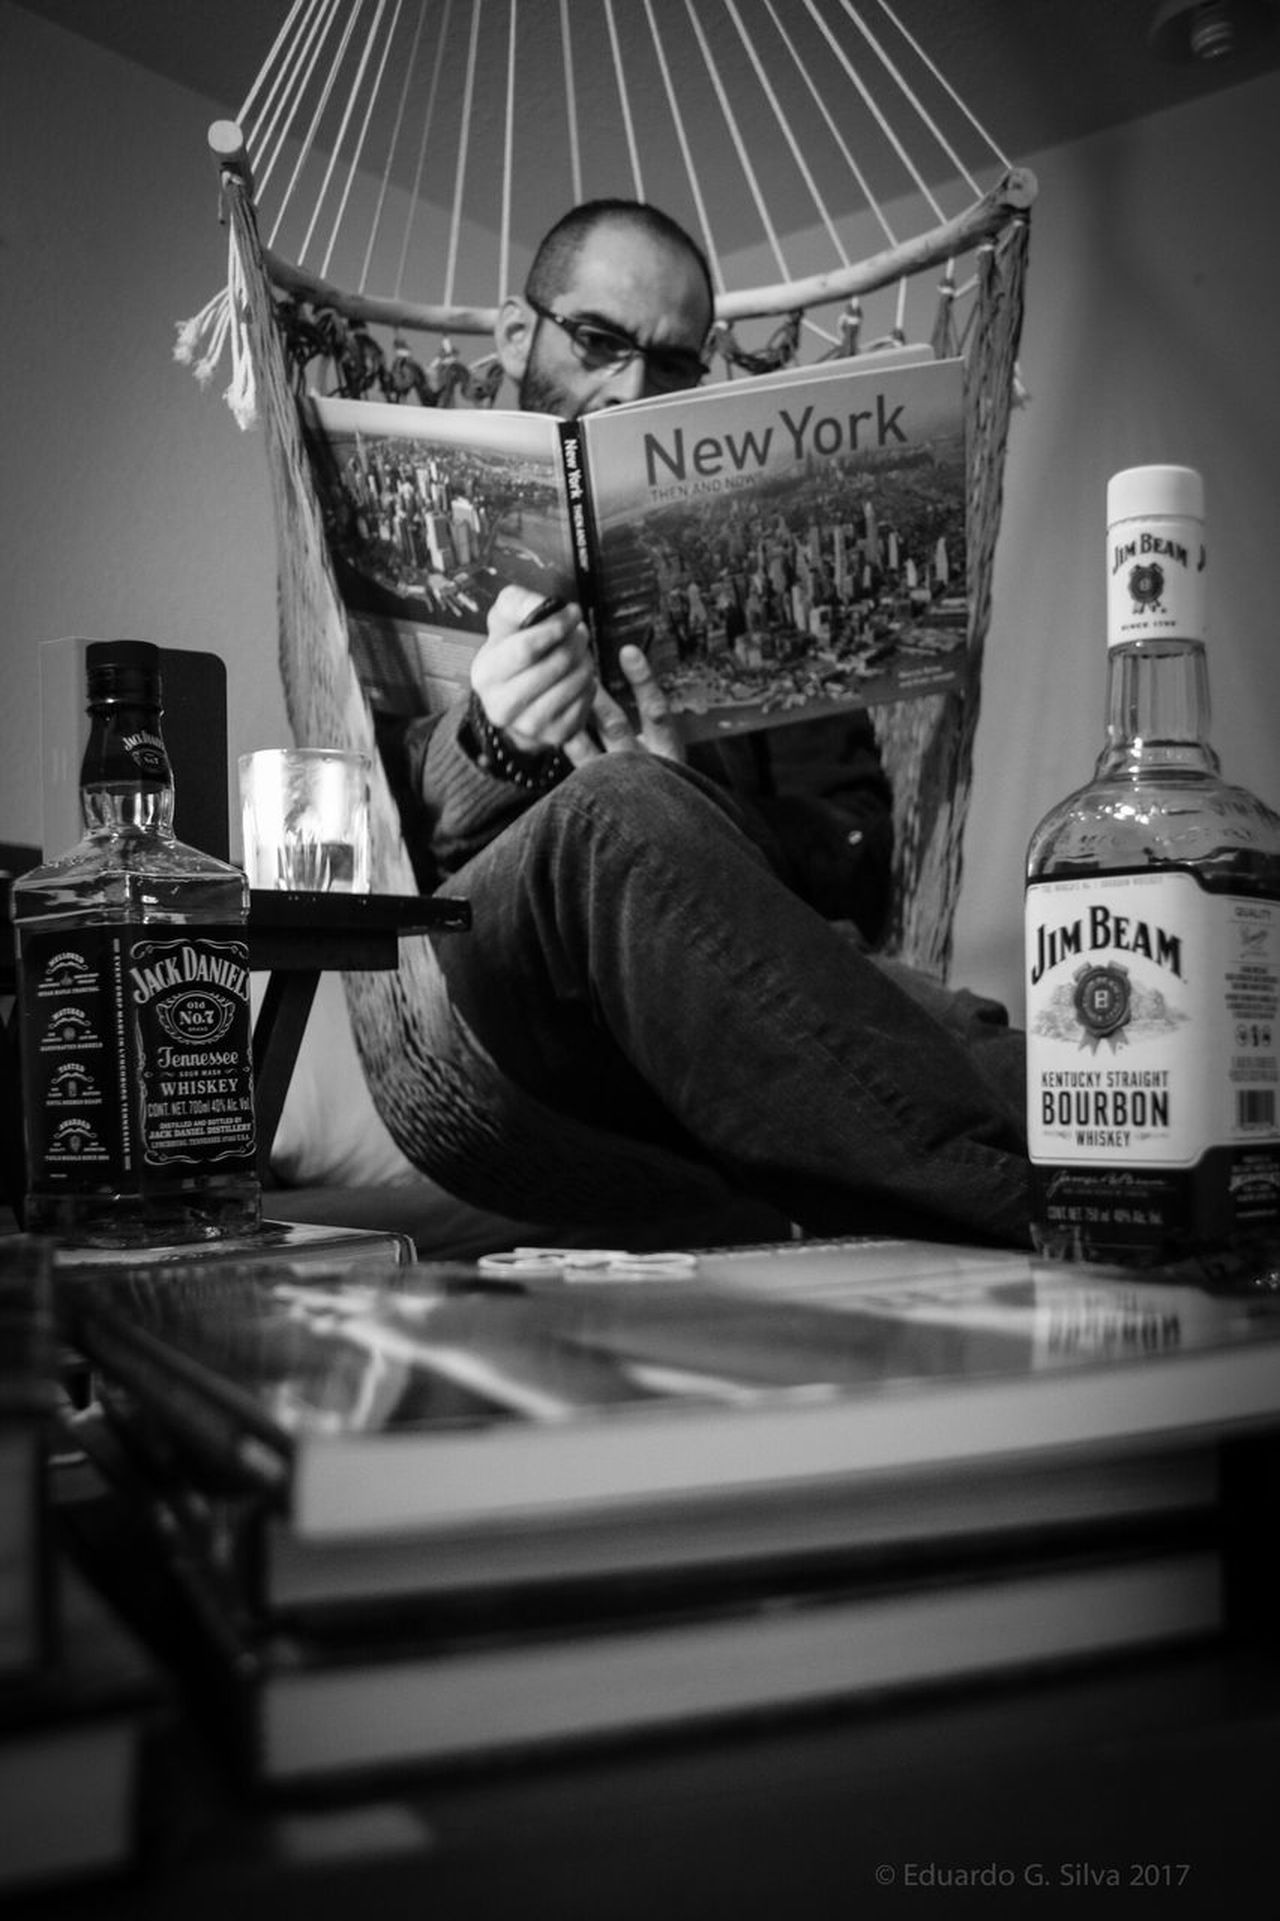 Black & White One Person Lifestyles Home Interior Men Black And White Blackandwhite Photography Black And White Photography Black And White Collection  Portrait Self Portrait Books Book Man